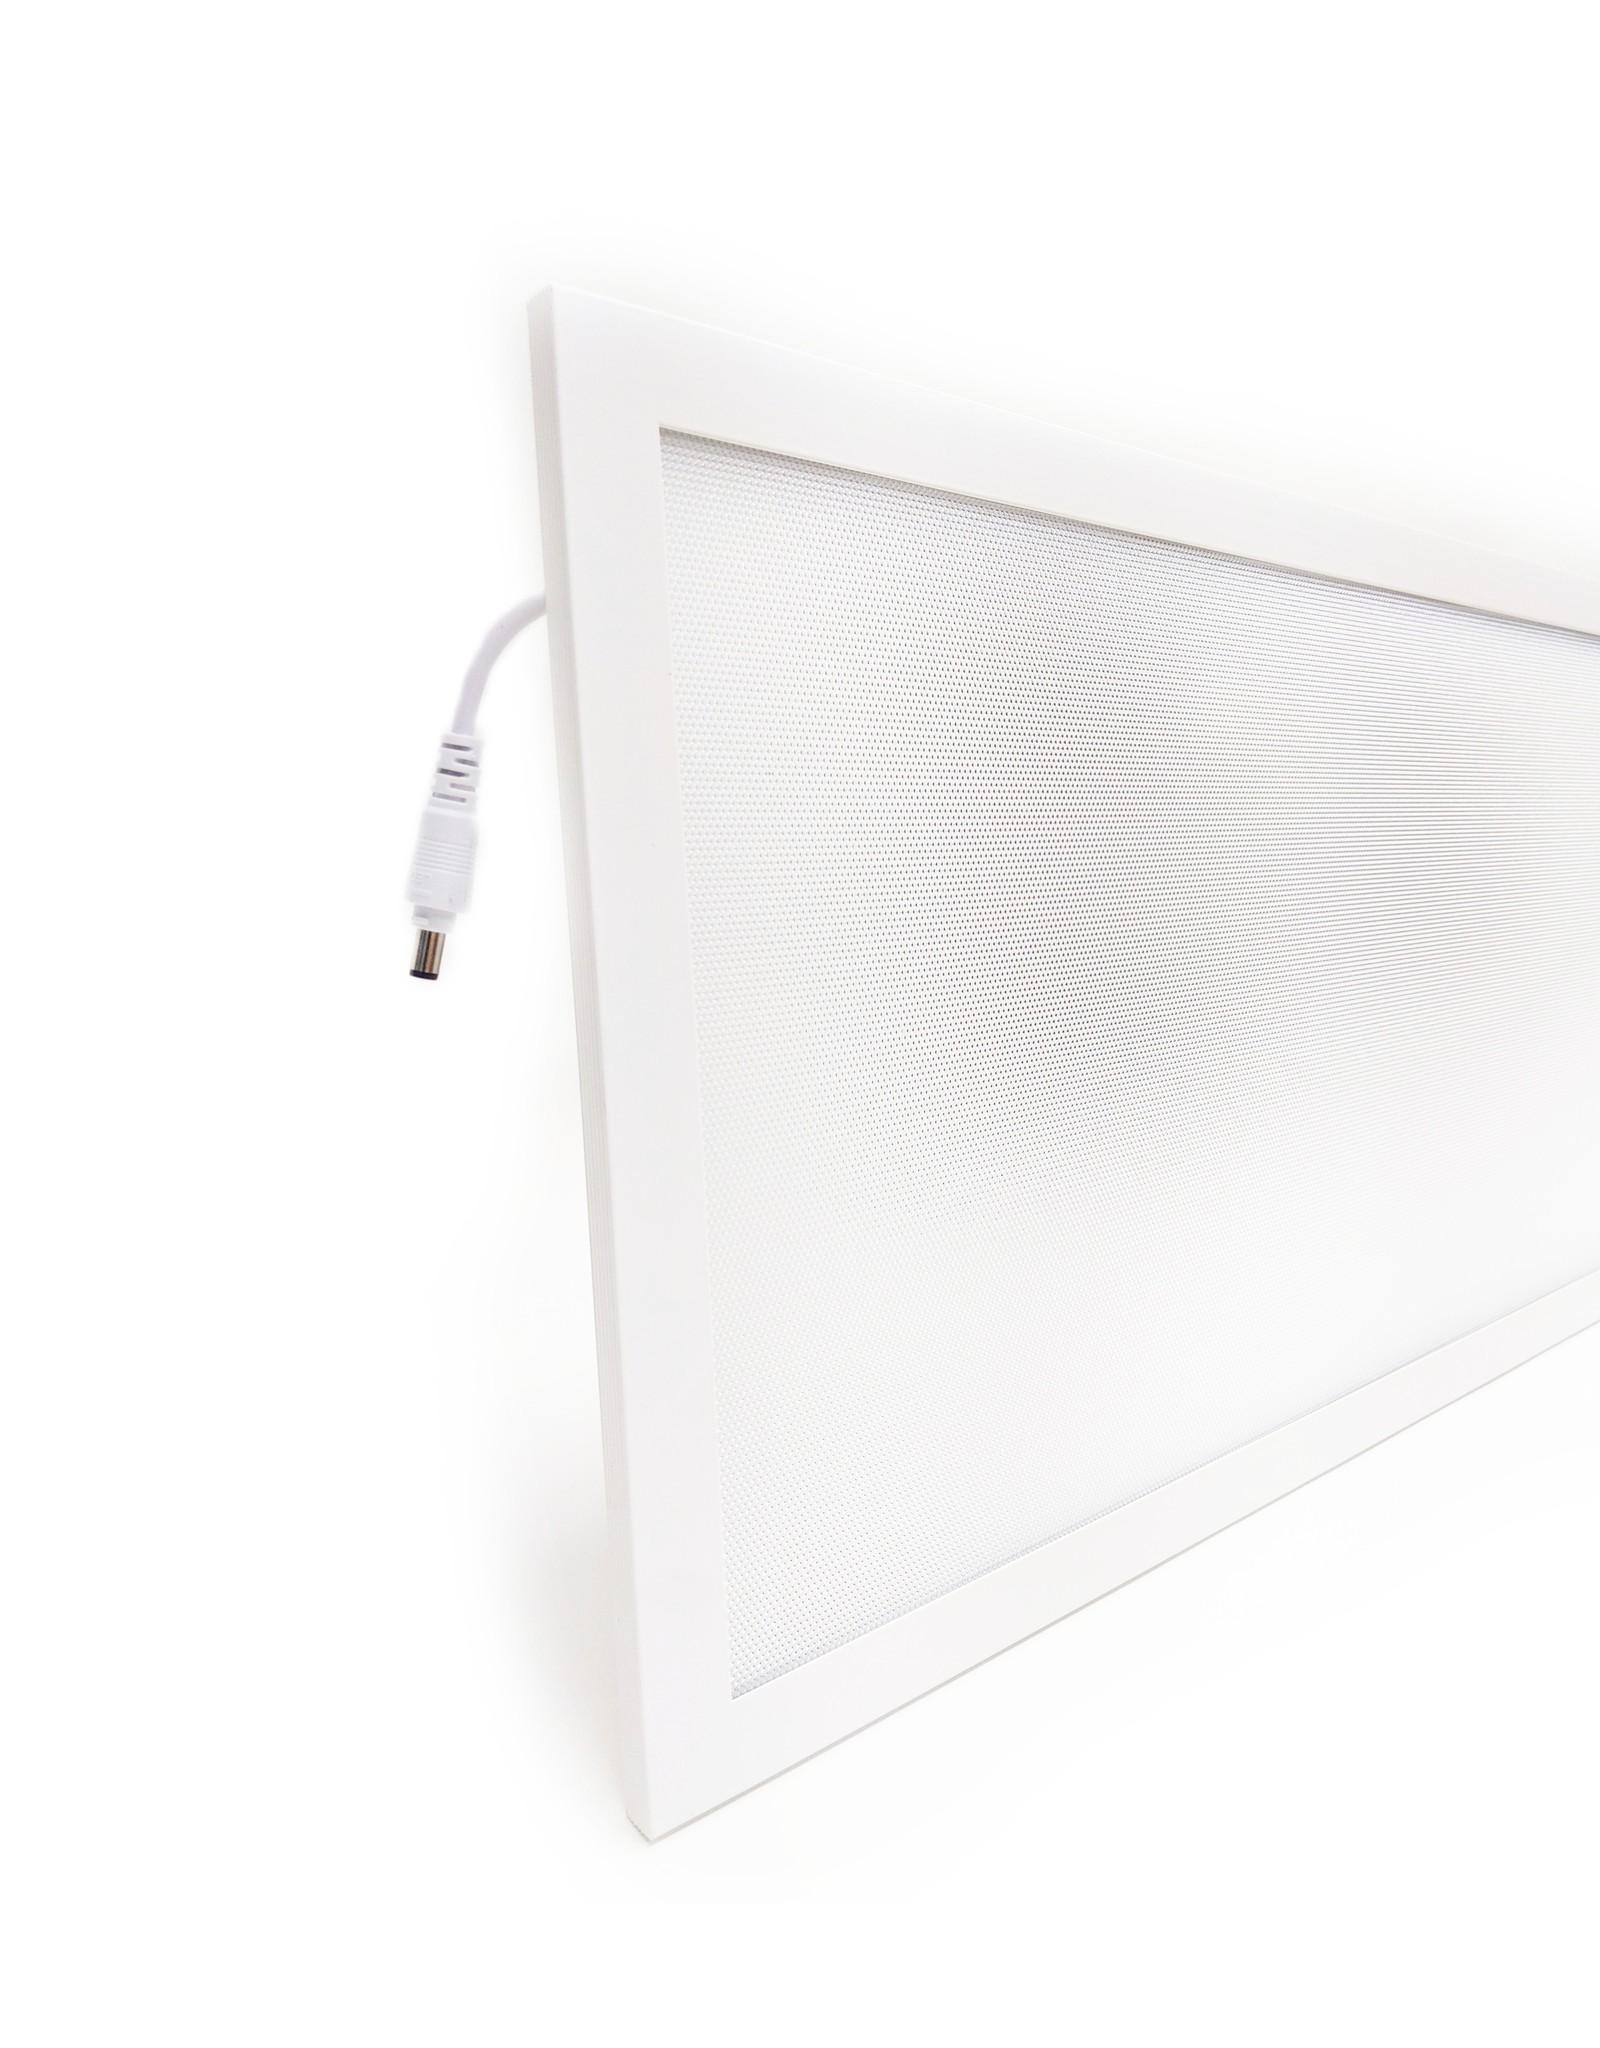 LedLed LED Panel Luxor 32W 6000k